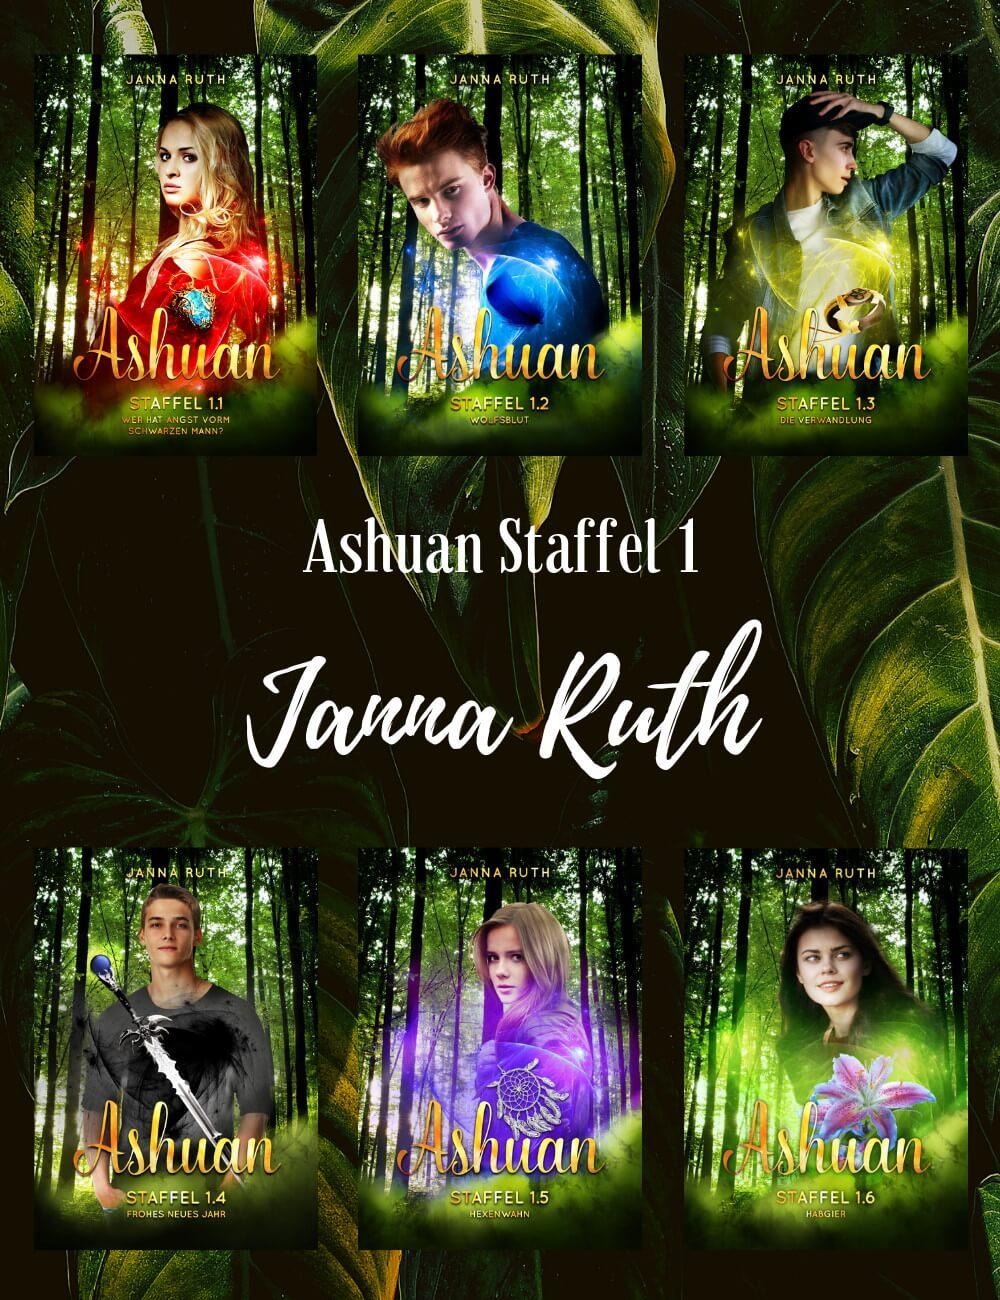 Ashuan Staffel 1